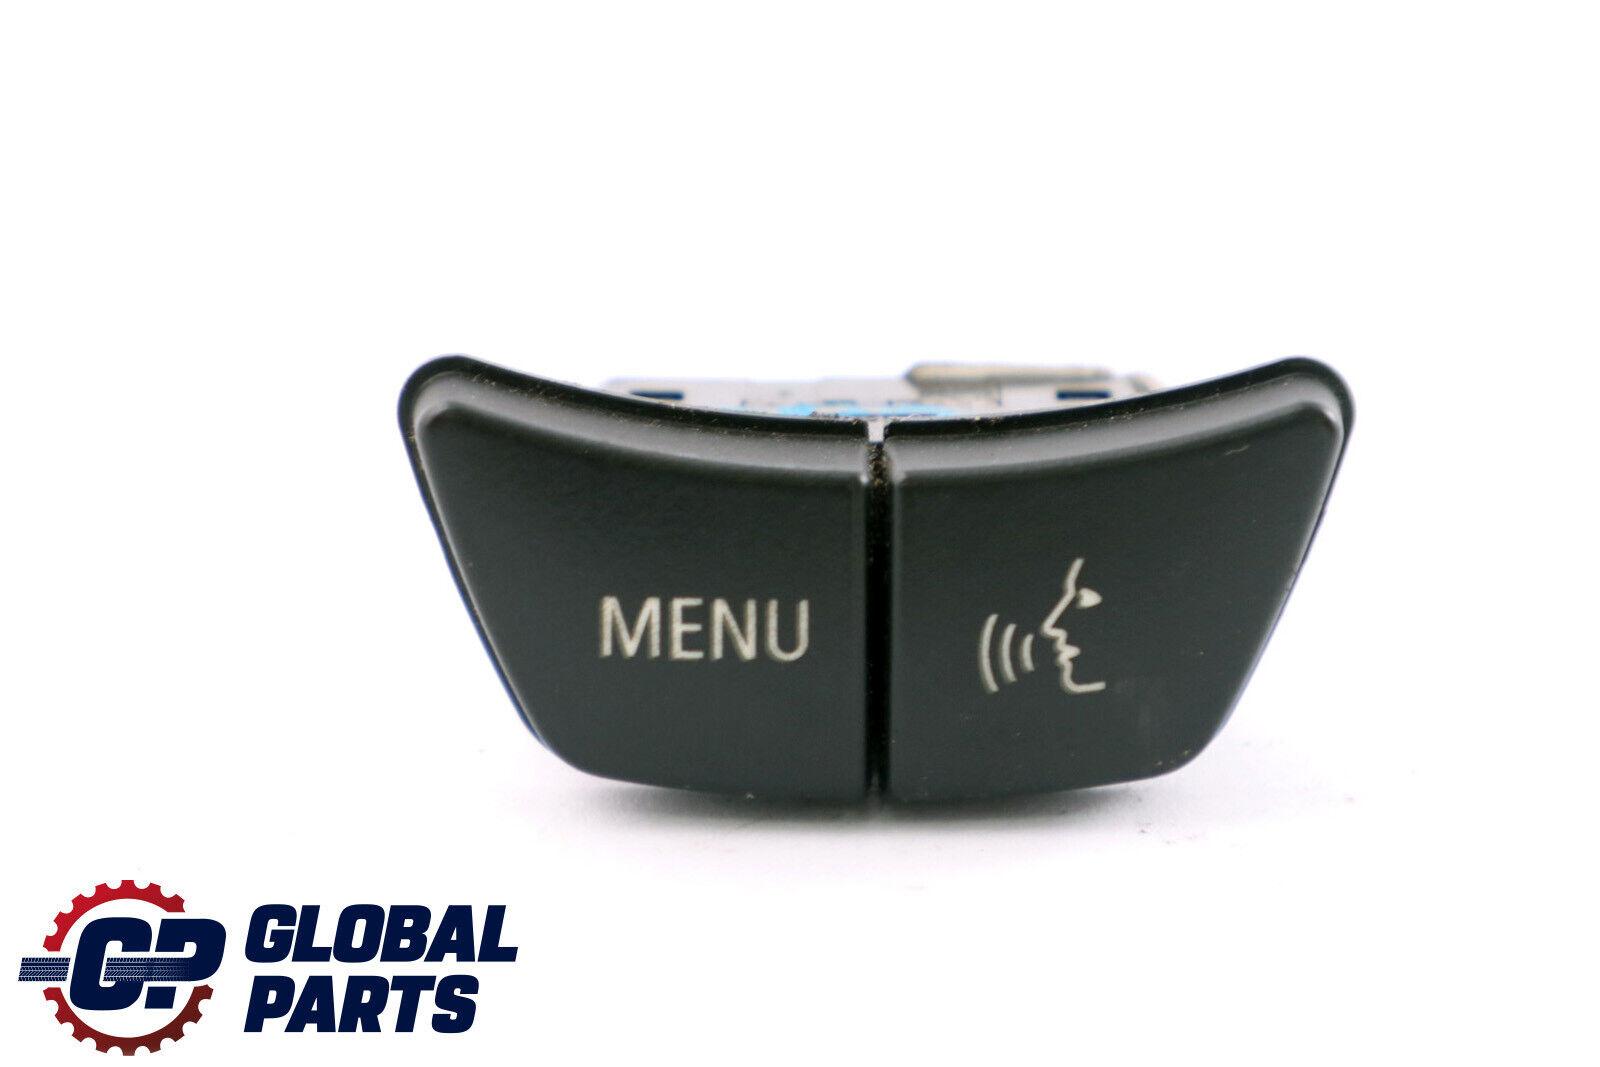 BMW 3 Série E90 LCi E91 E92 E93 LCI idrive Controller Housse Support 9170918